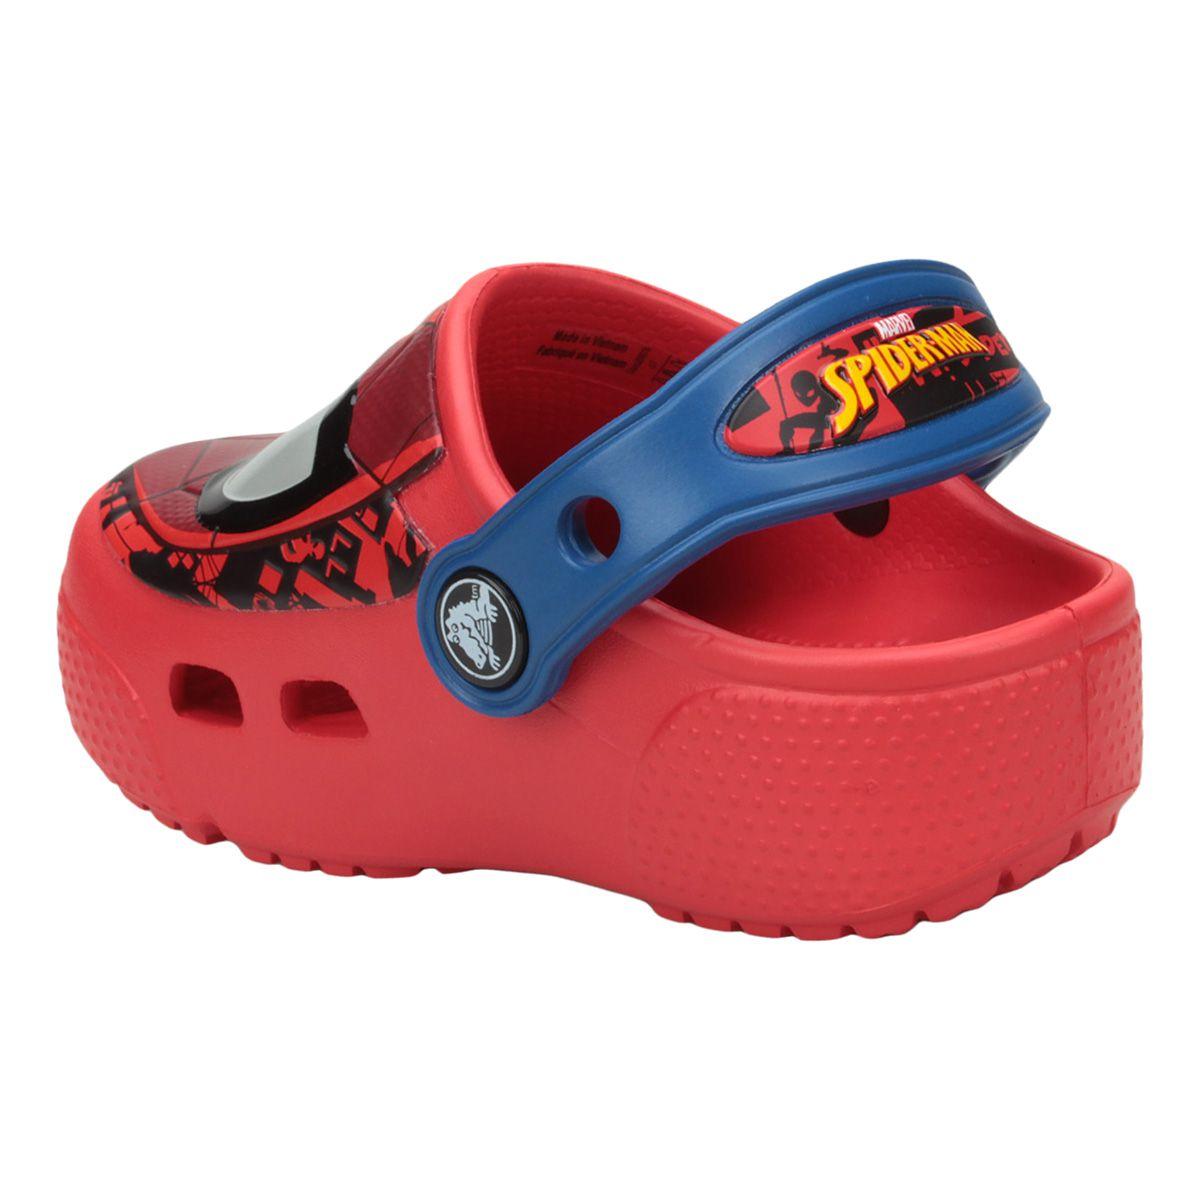 Sandália Crocs Kids Spider Man Lights Clogs - Vermelho